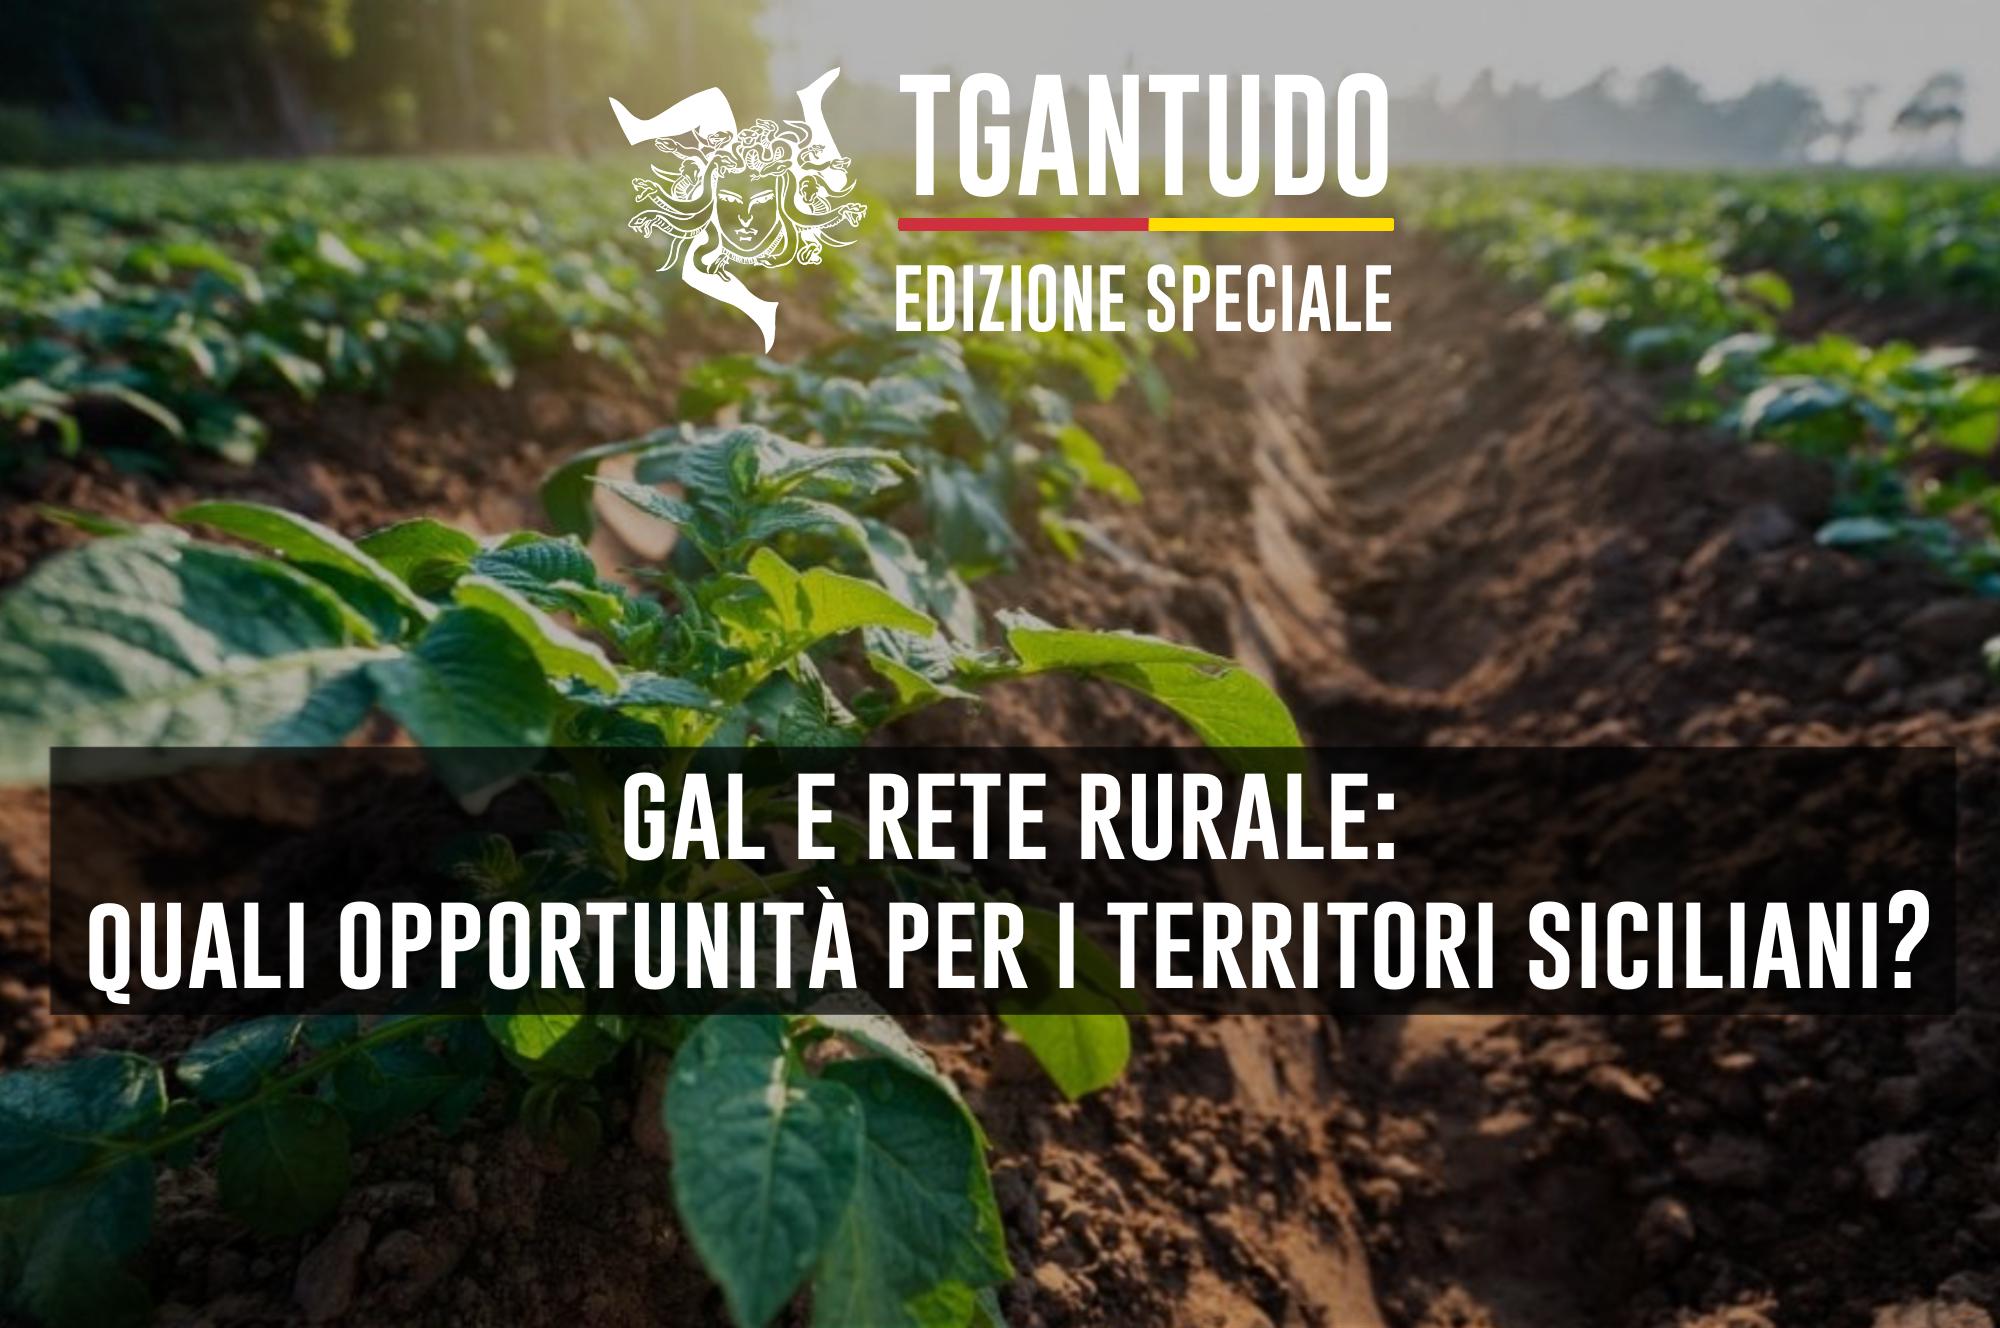 TGAntudo – Gal e rete rurale: quali opportunità per i territori siciliani?